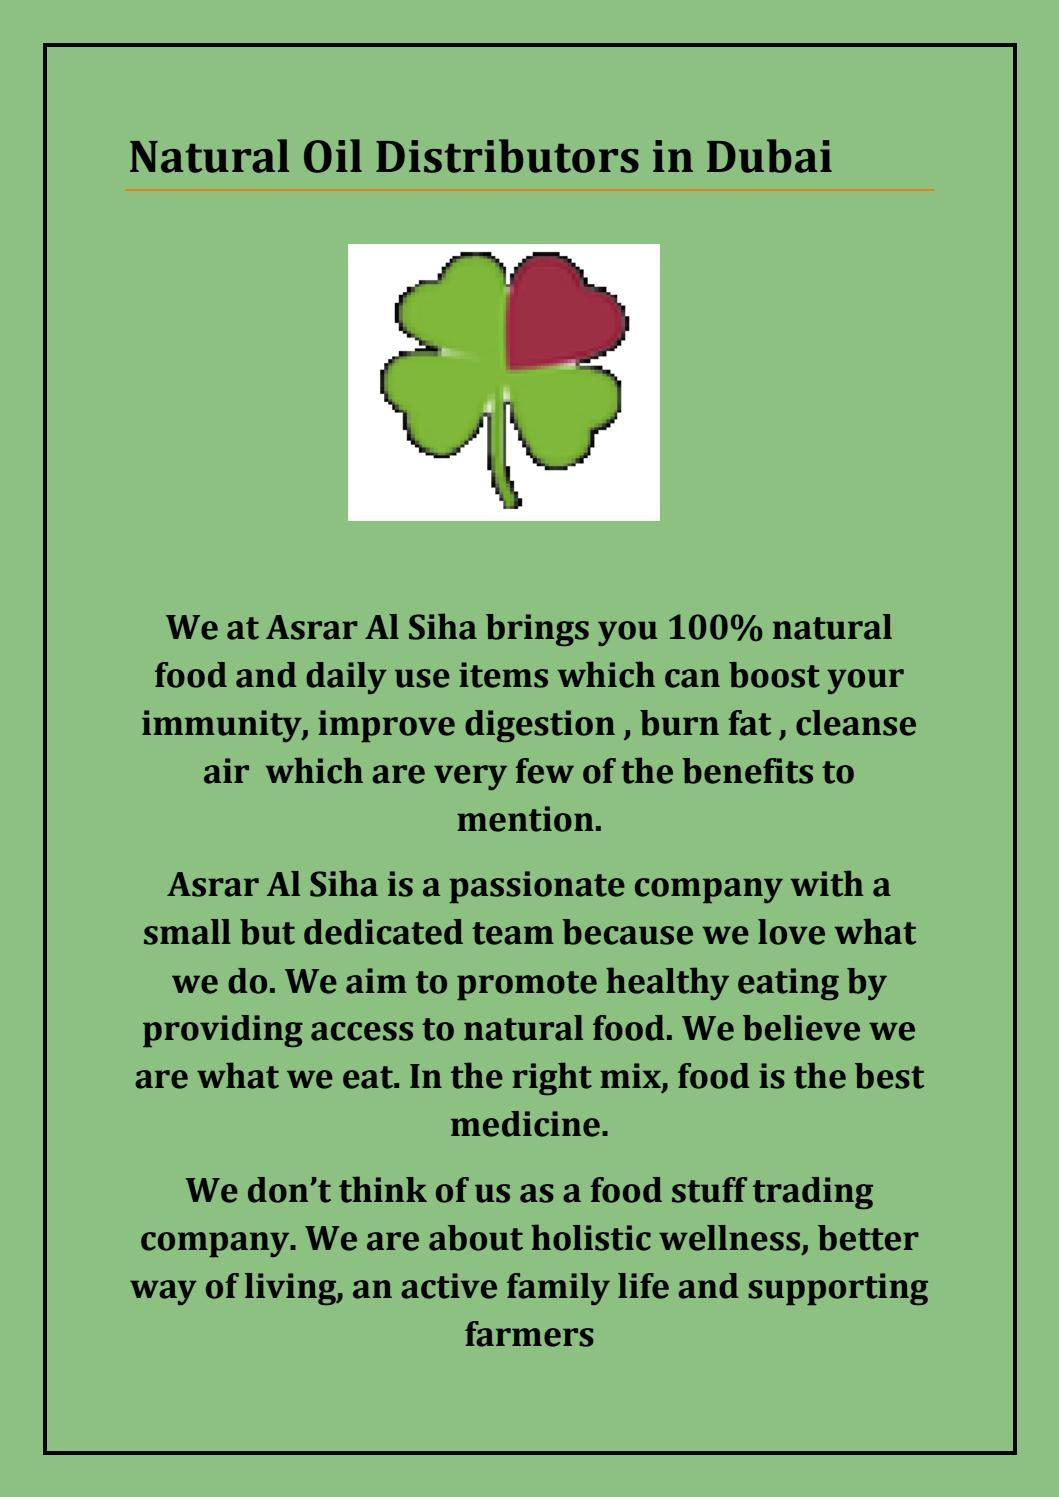 Natural Oil Distributors in Dubai by asraralsiha - issuu